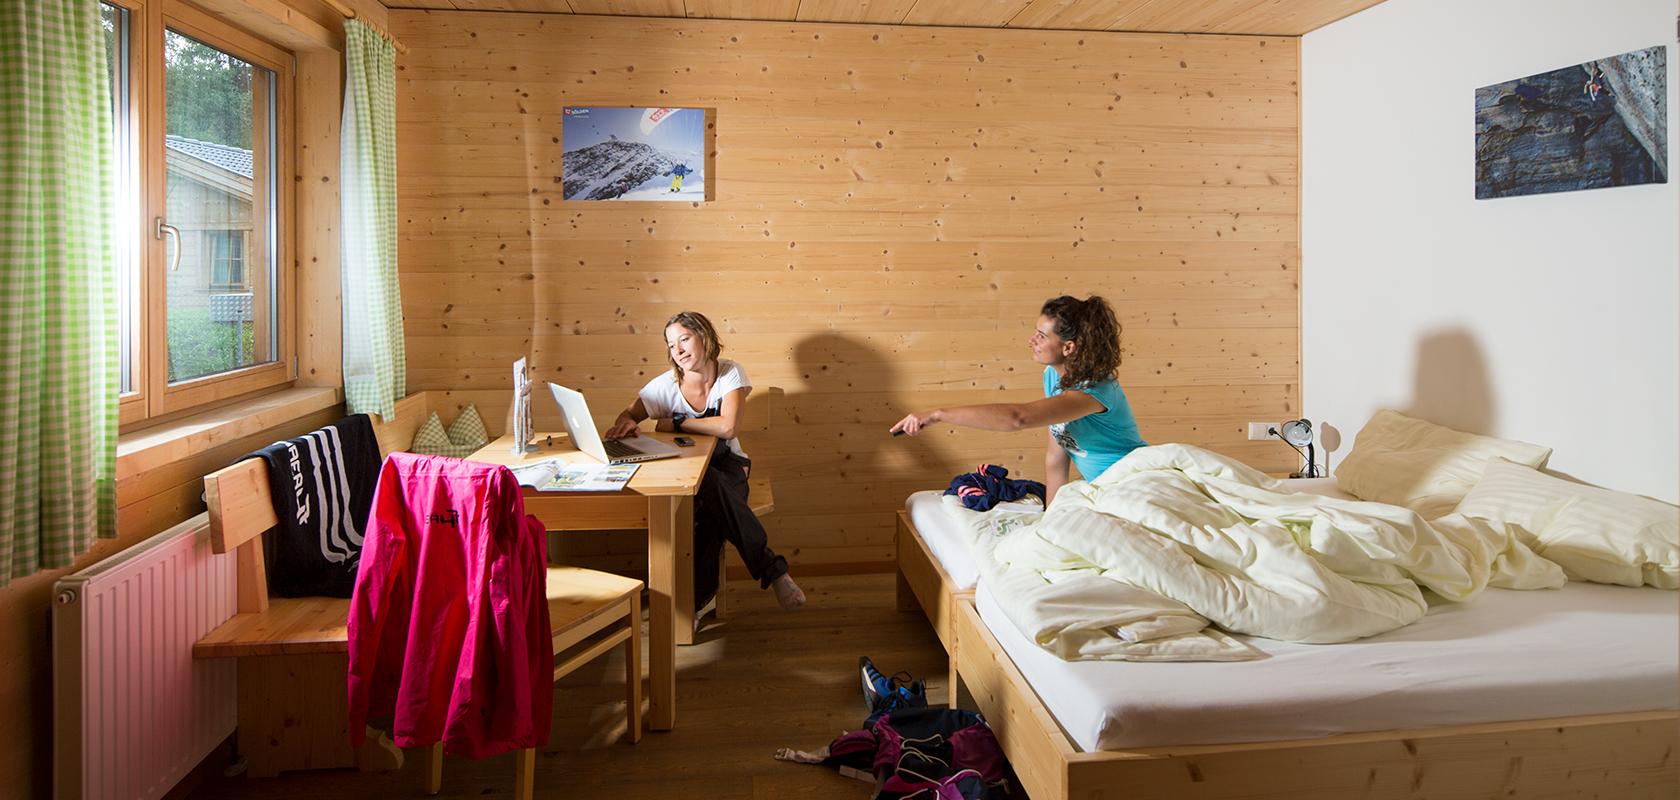 Doppelzimmer im Outddor Freizeitpark